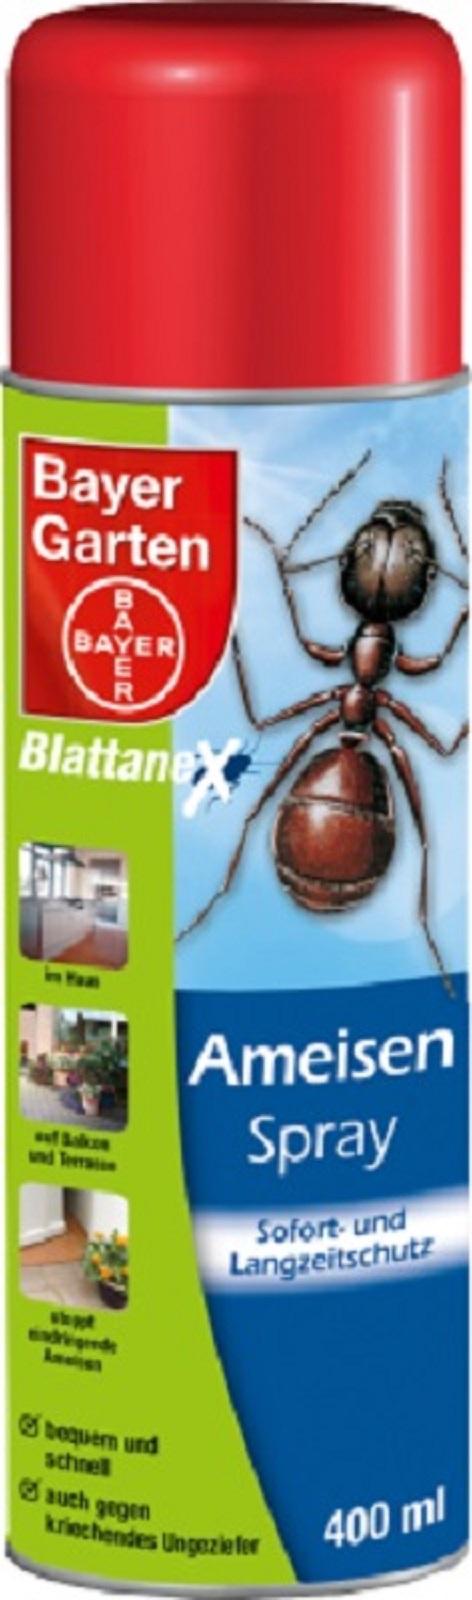 Bayer Ameisenspray 400 ml